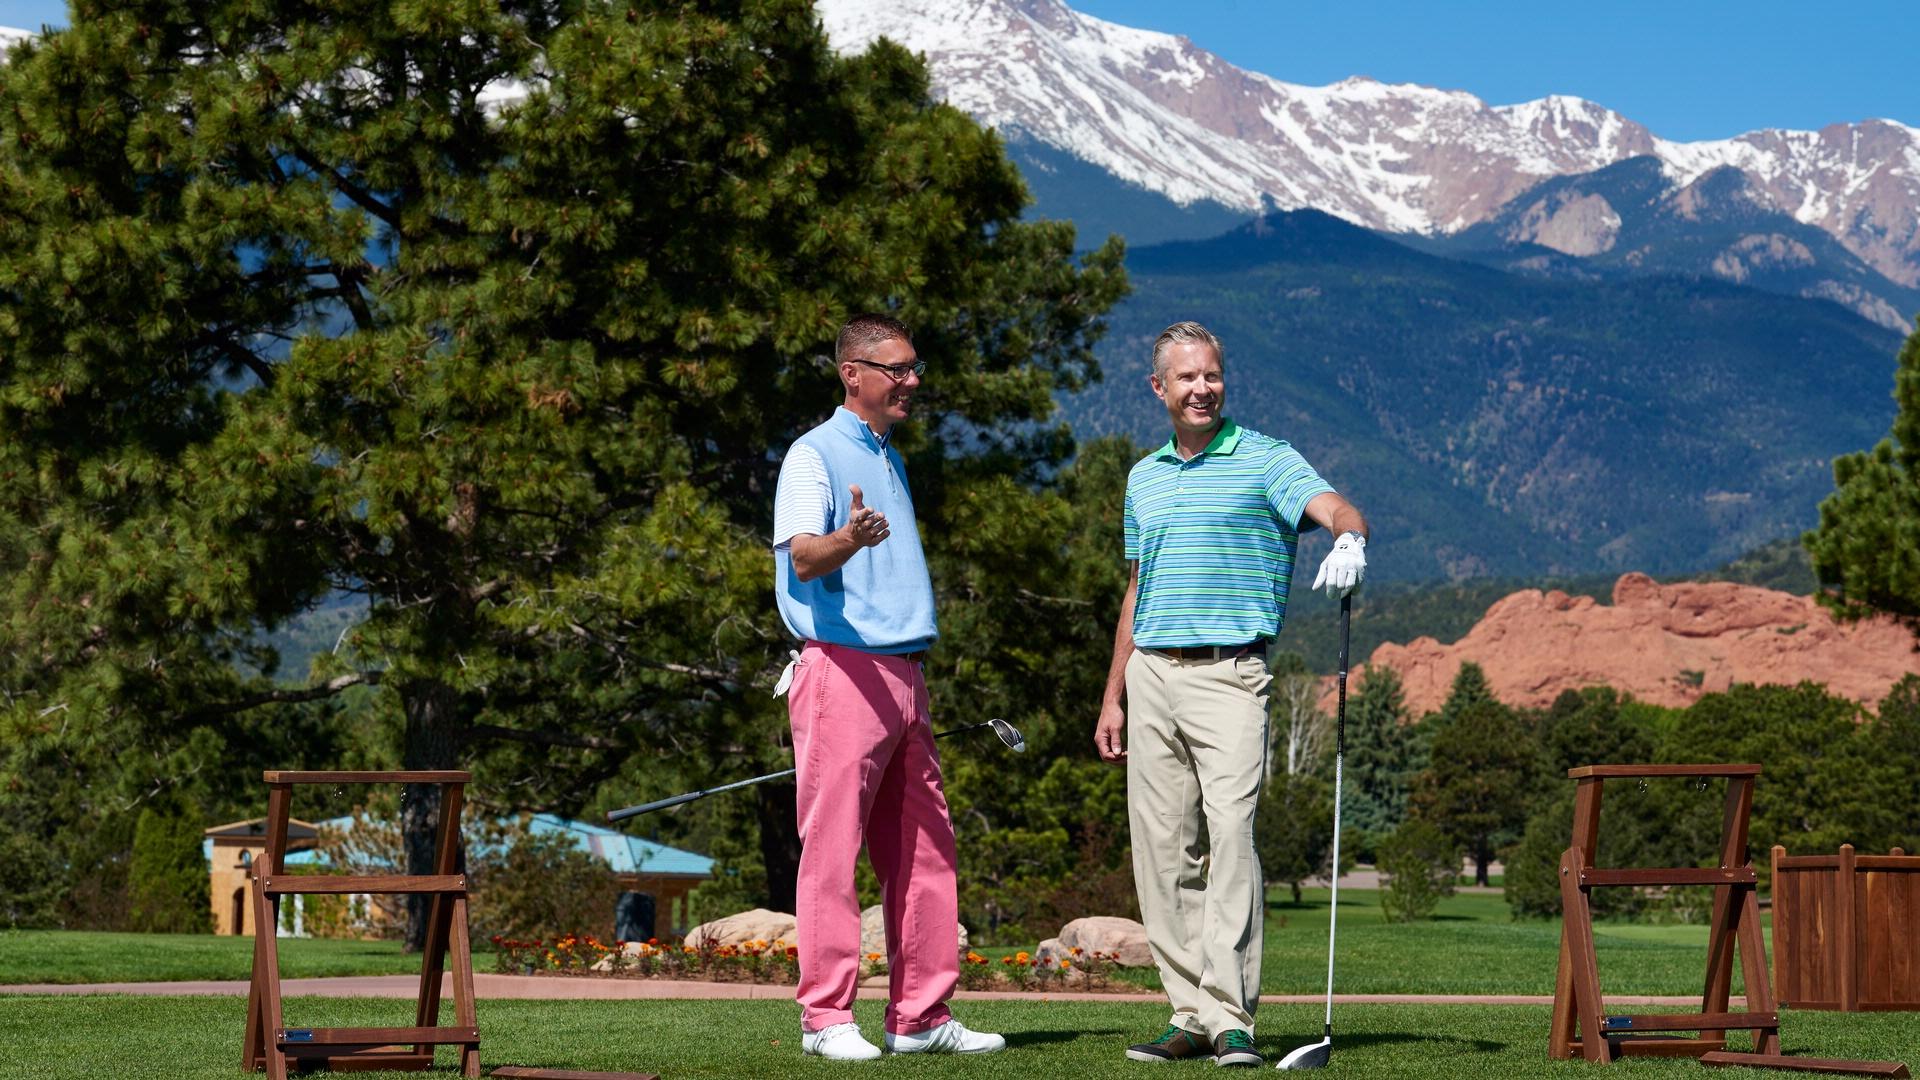 Golf at garden of the gods club and resort - Restaurants near garden of the gods ...